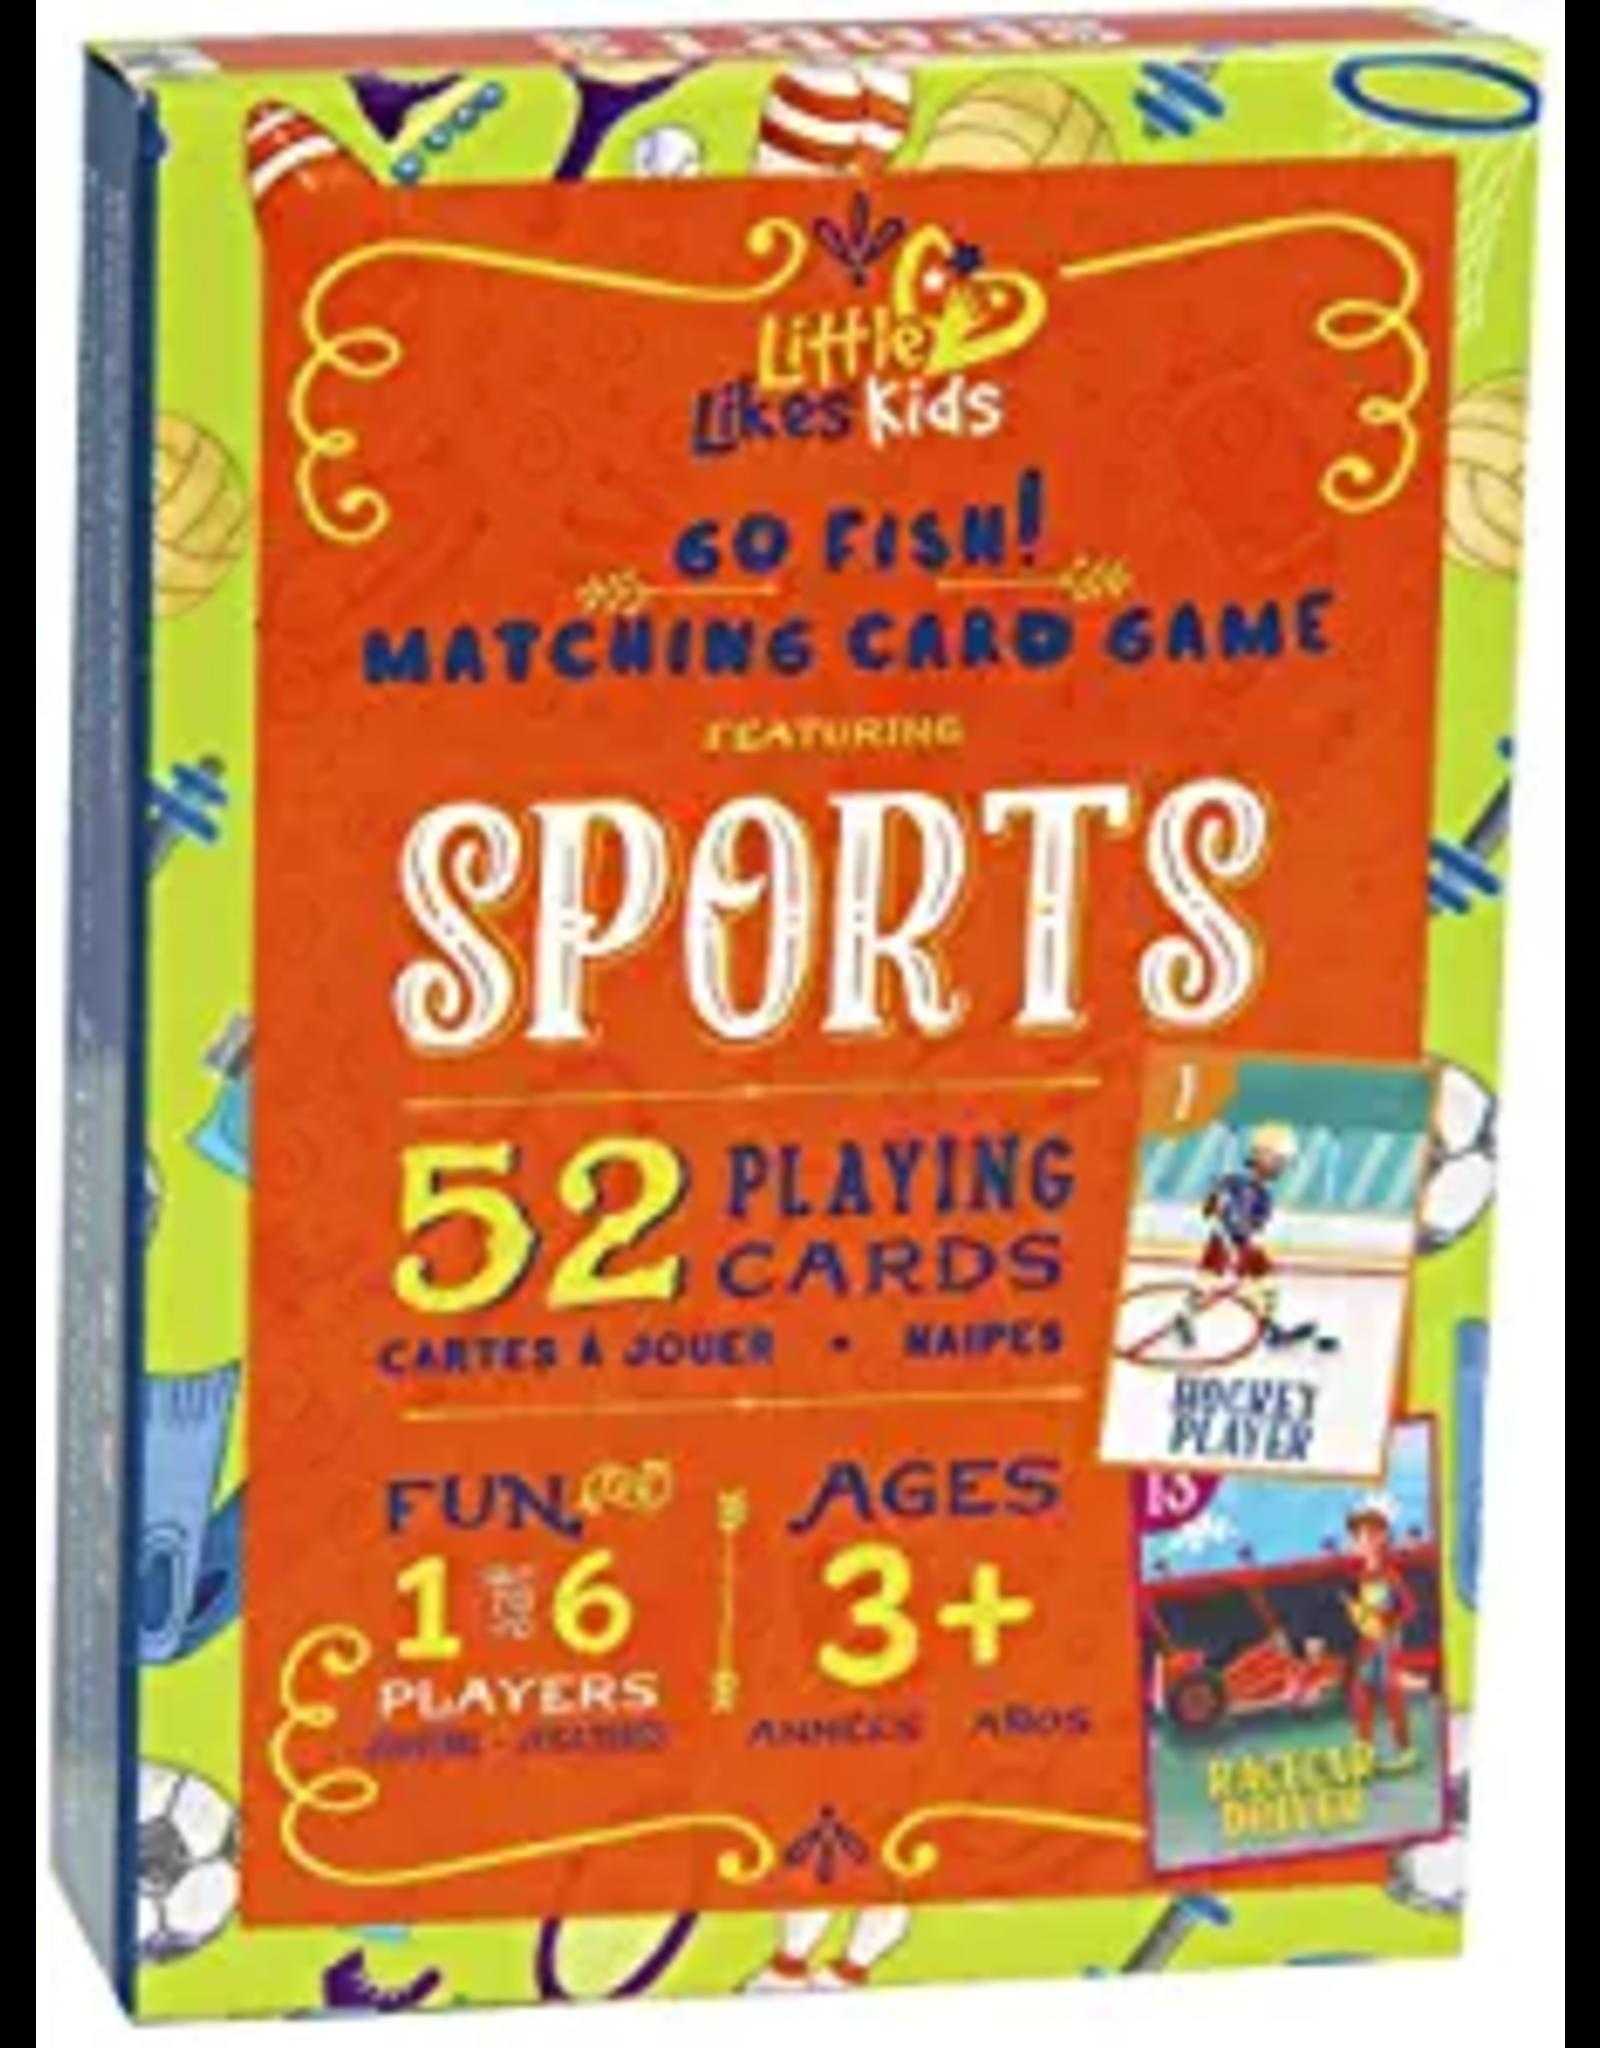 Little Likes Kids Go Fish! Sports